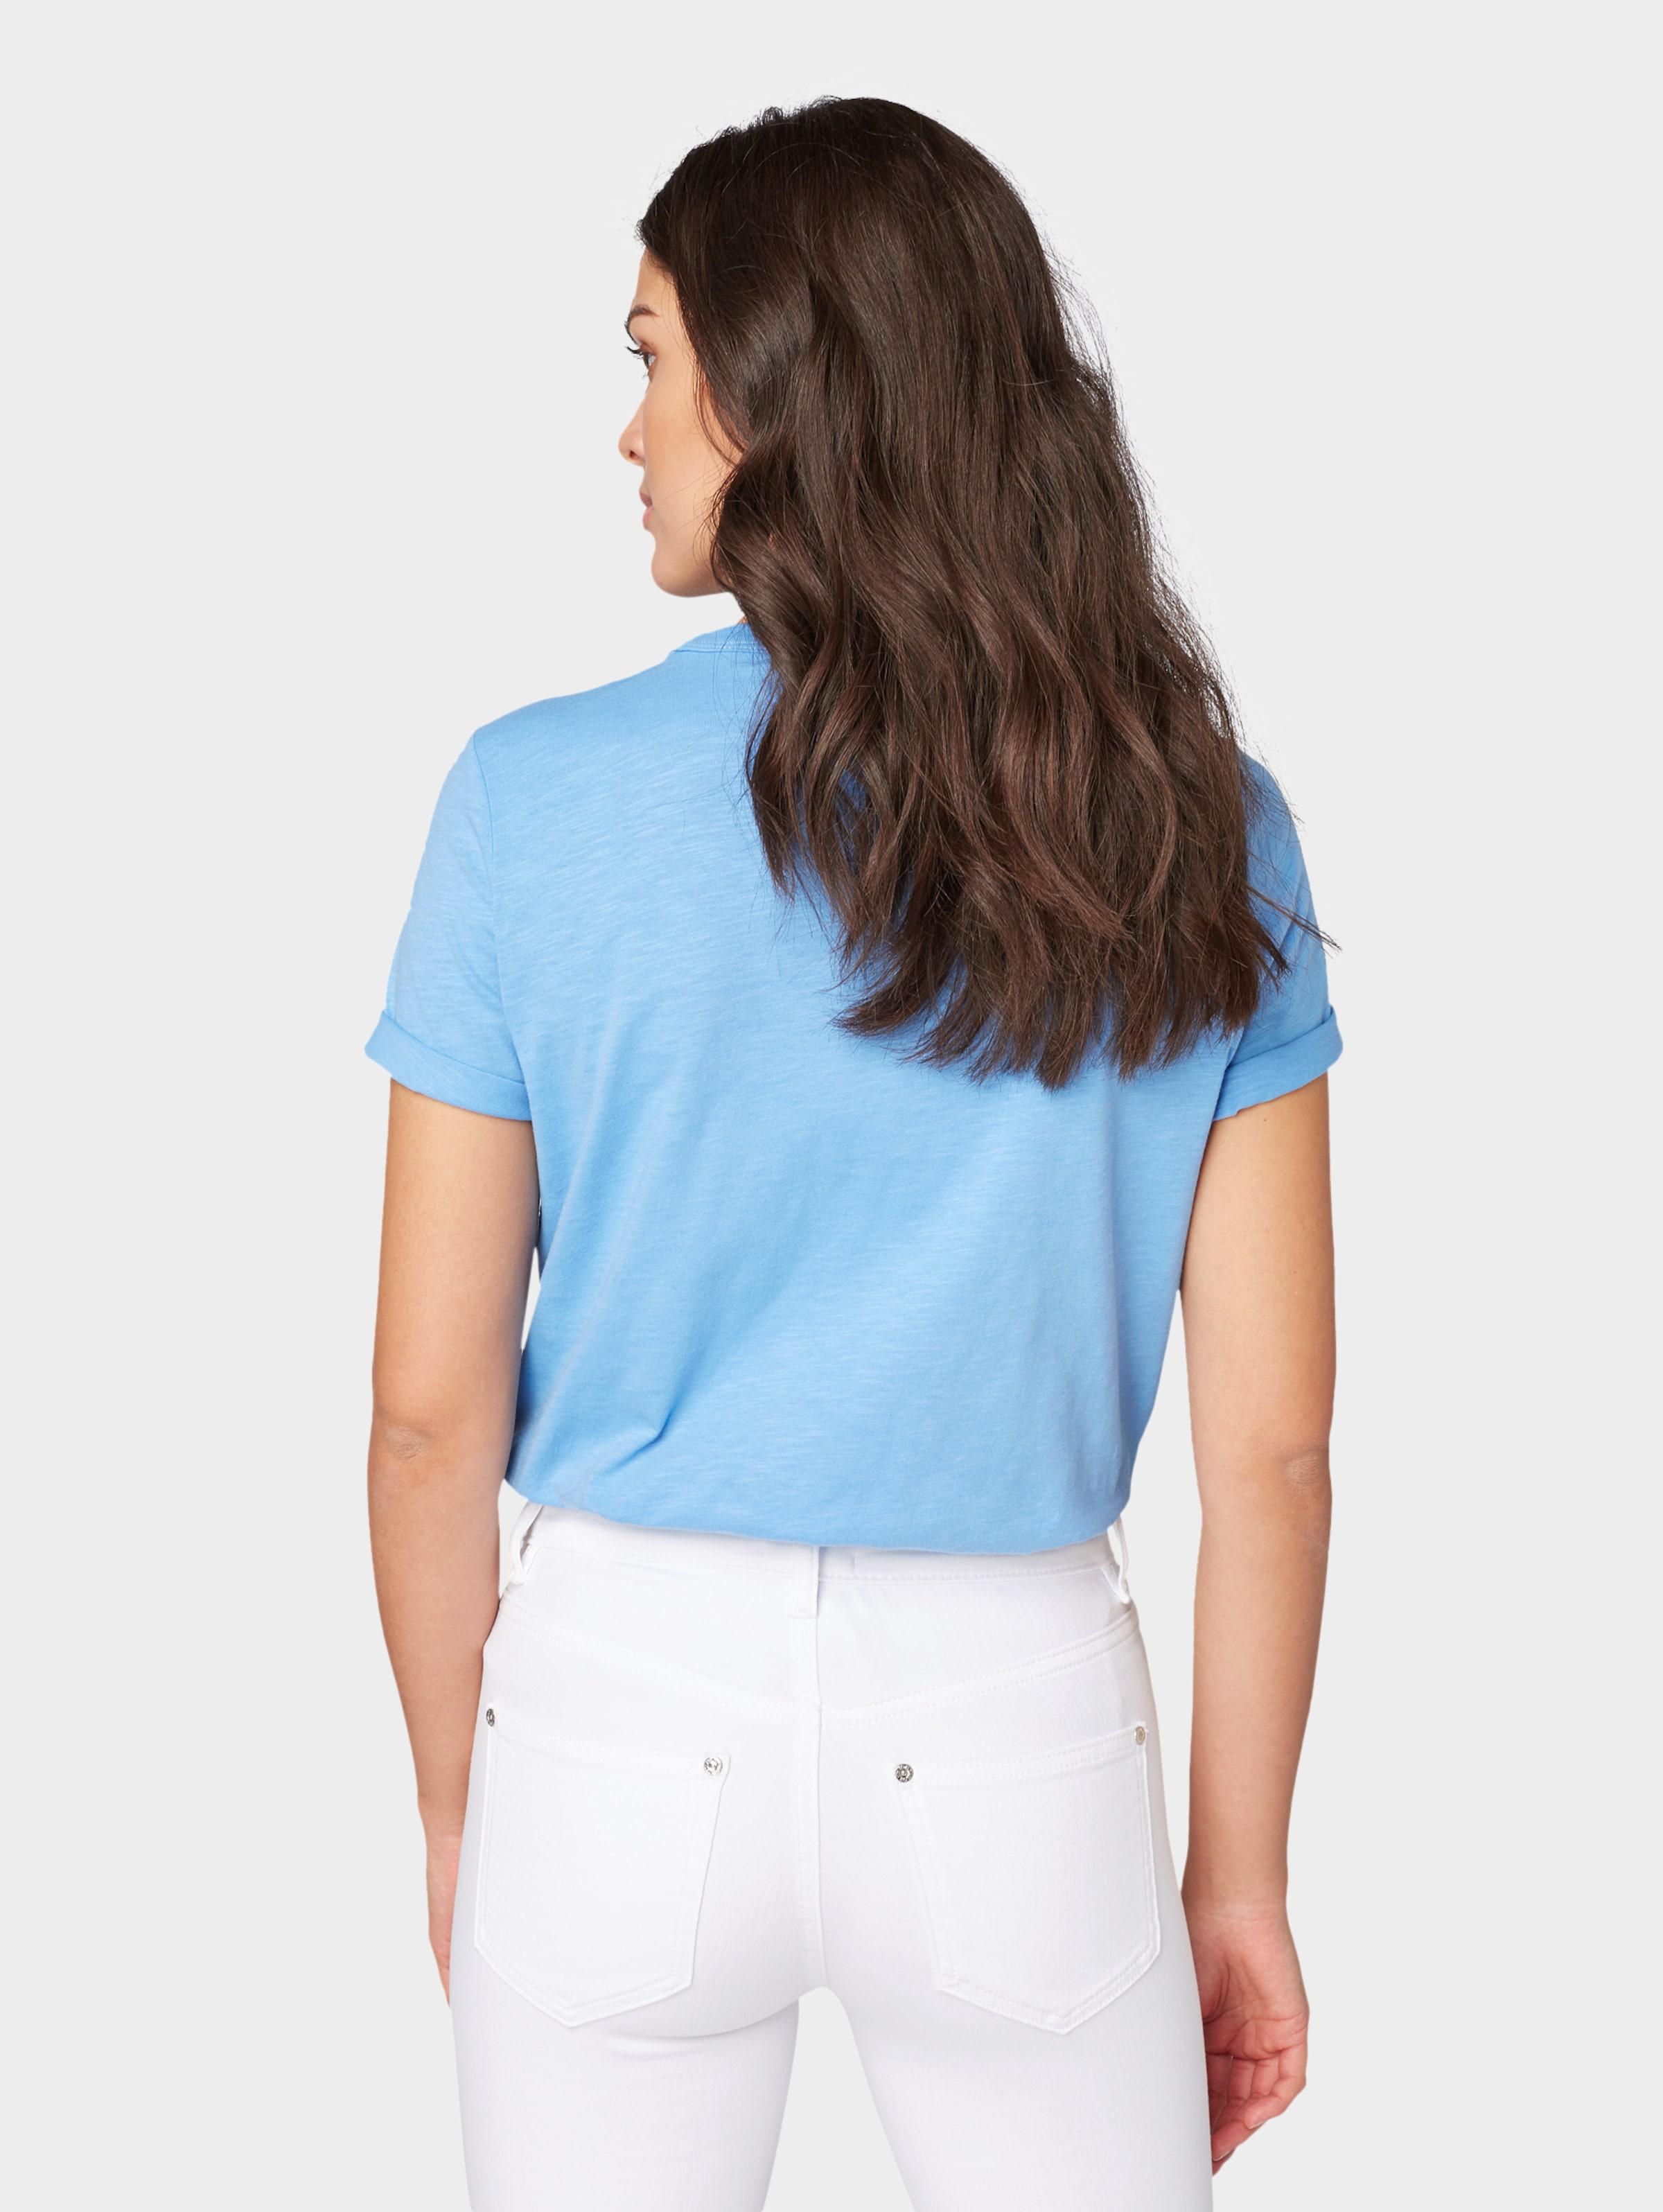 shirt In Tailor Tom T BlauRot Weiß 8XN0OwPnk